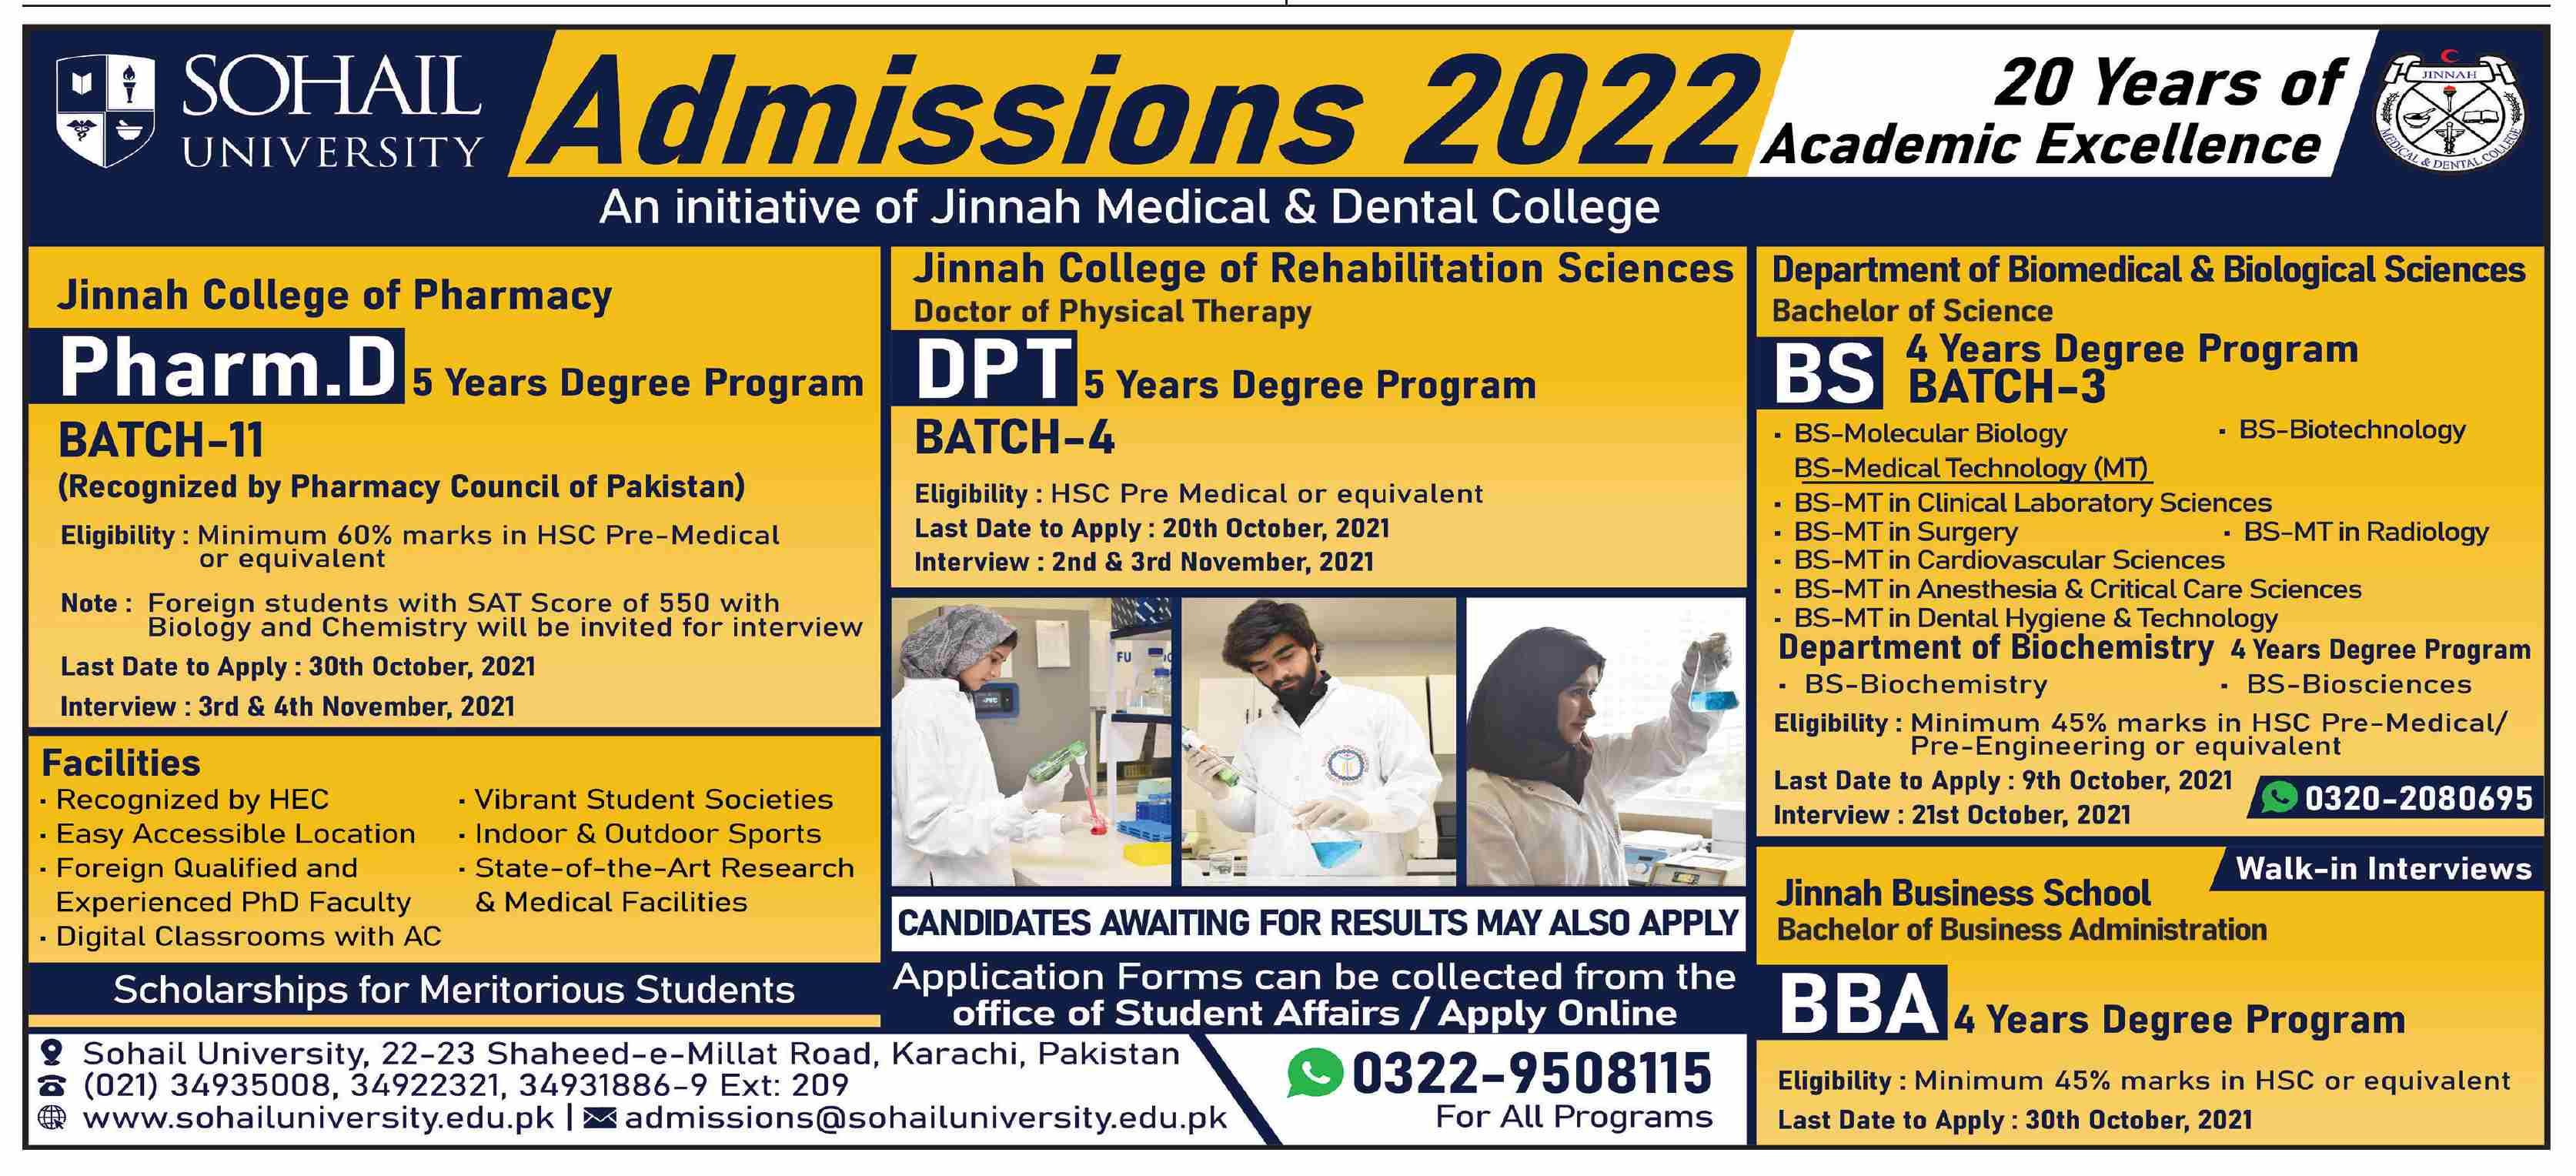 Sohail University Karachi Admissions